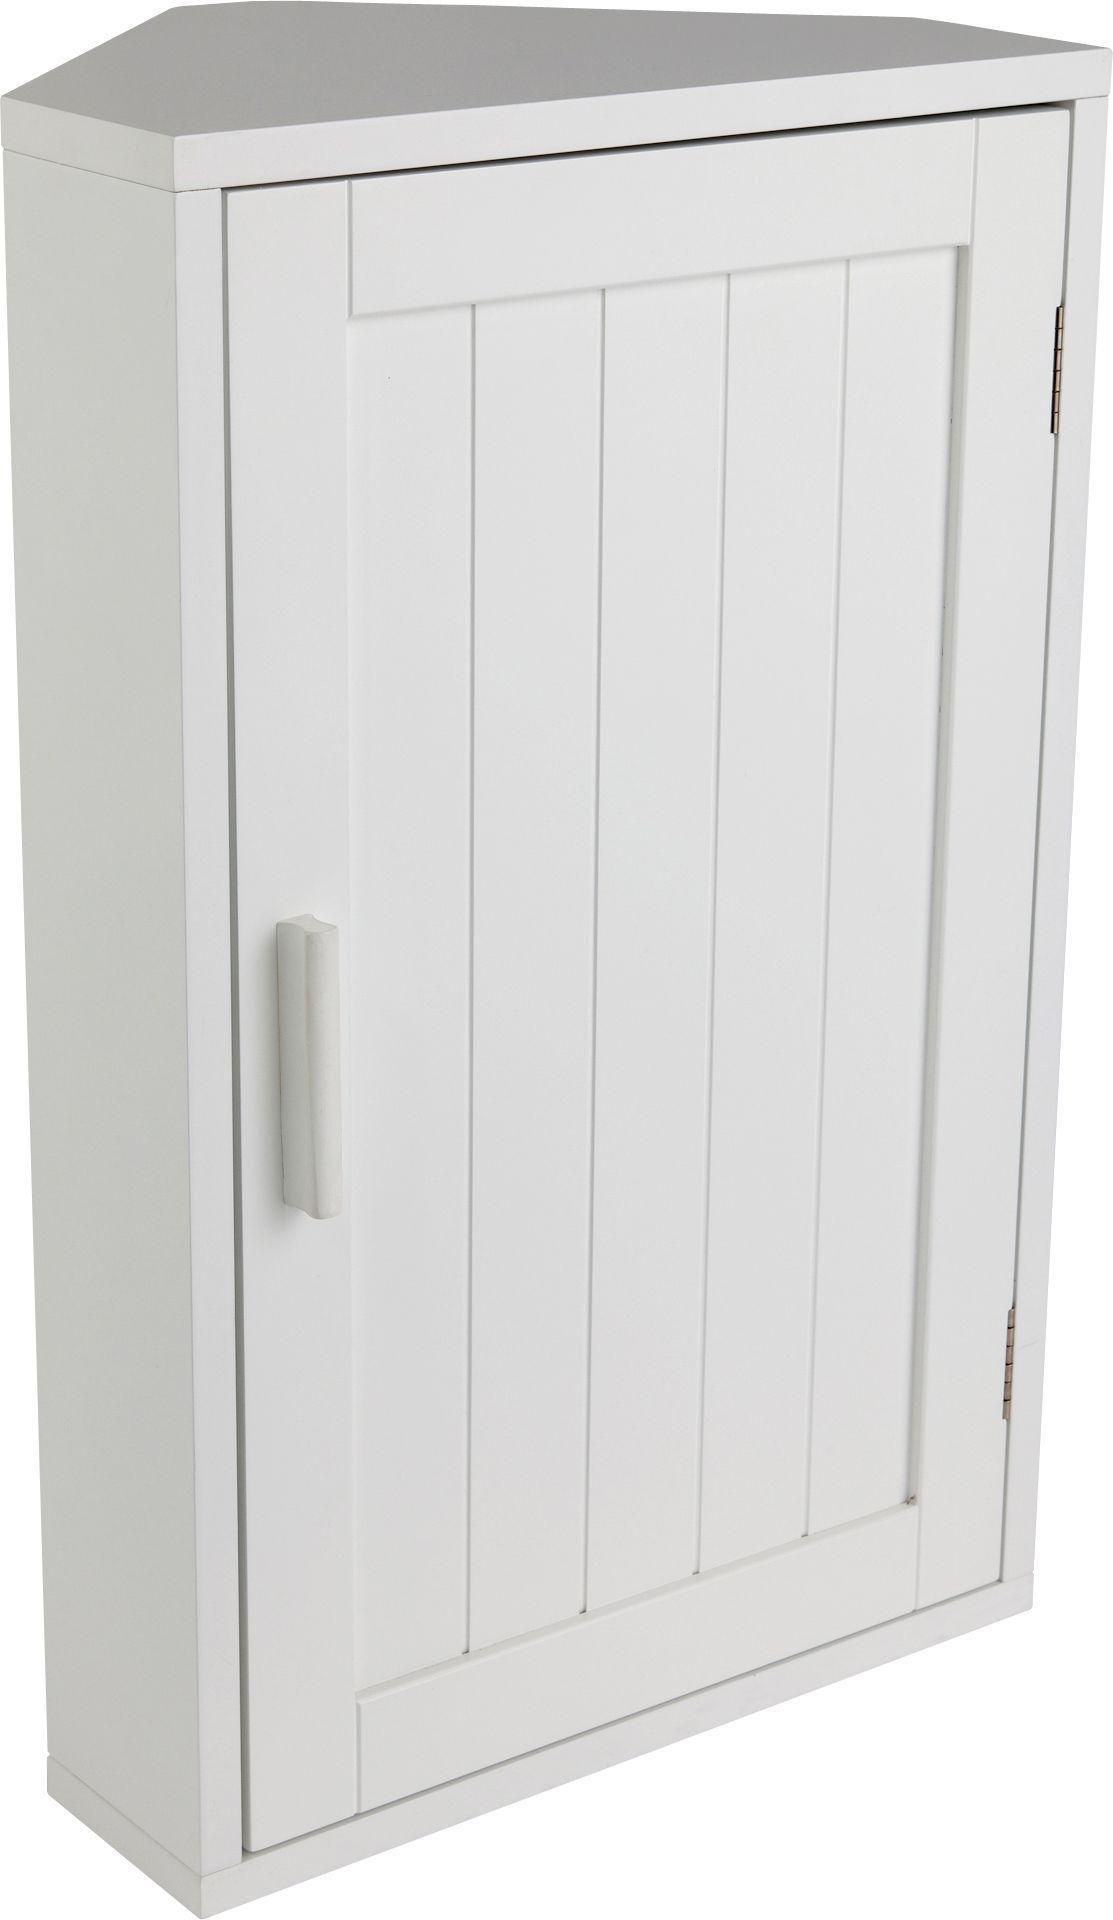 Buy HOME Wooden Corner Bathroom Cabinet White at Argoscouk